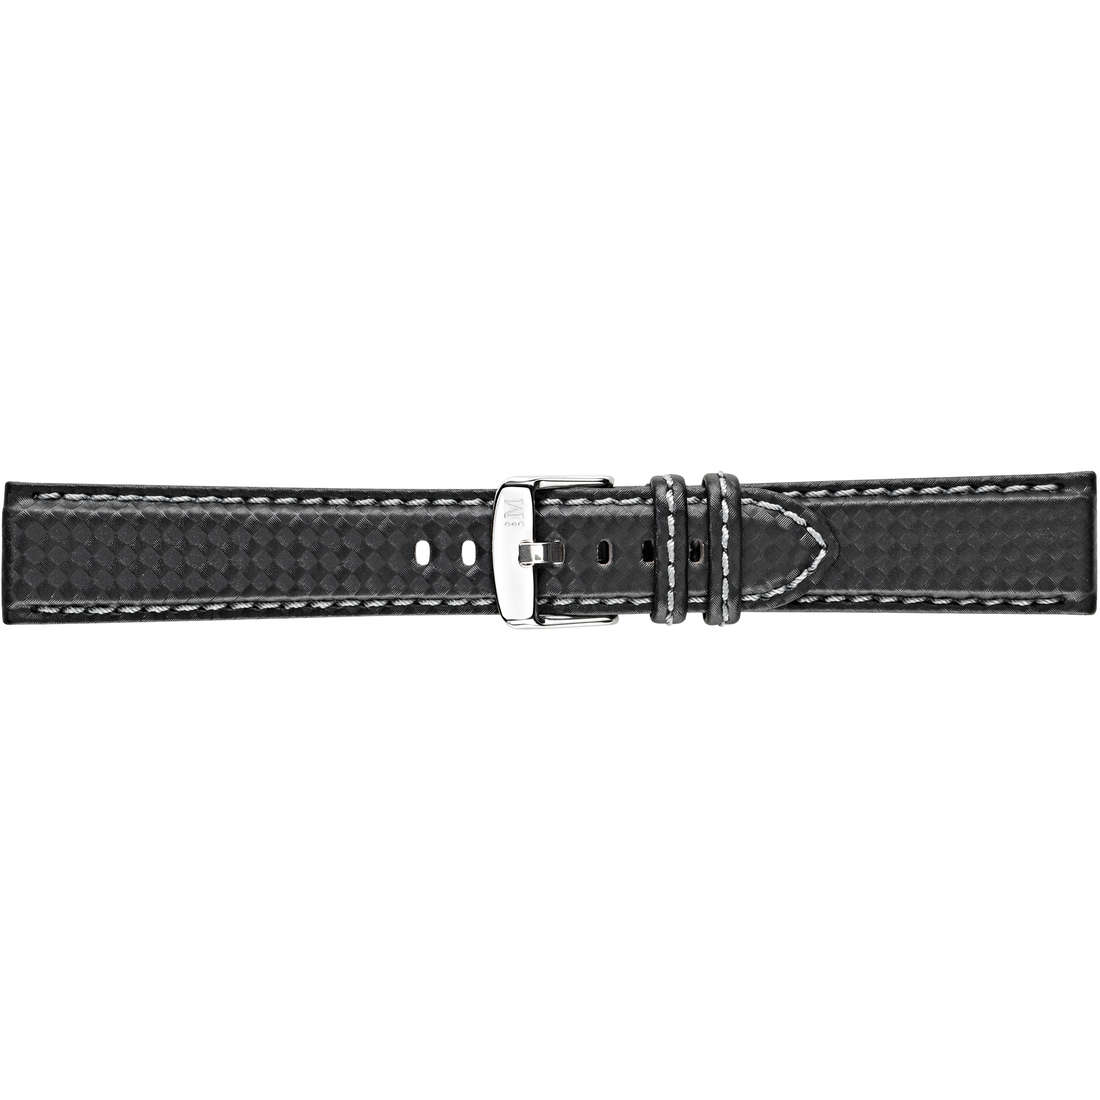 watch watch bands watch straps man Morellato Linea Sport A01U3586977891CR18